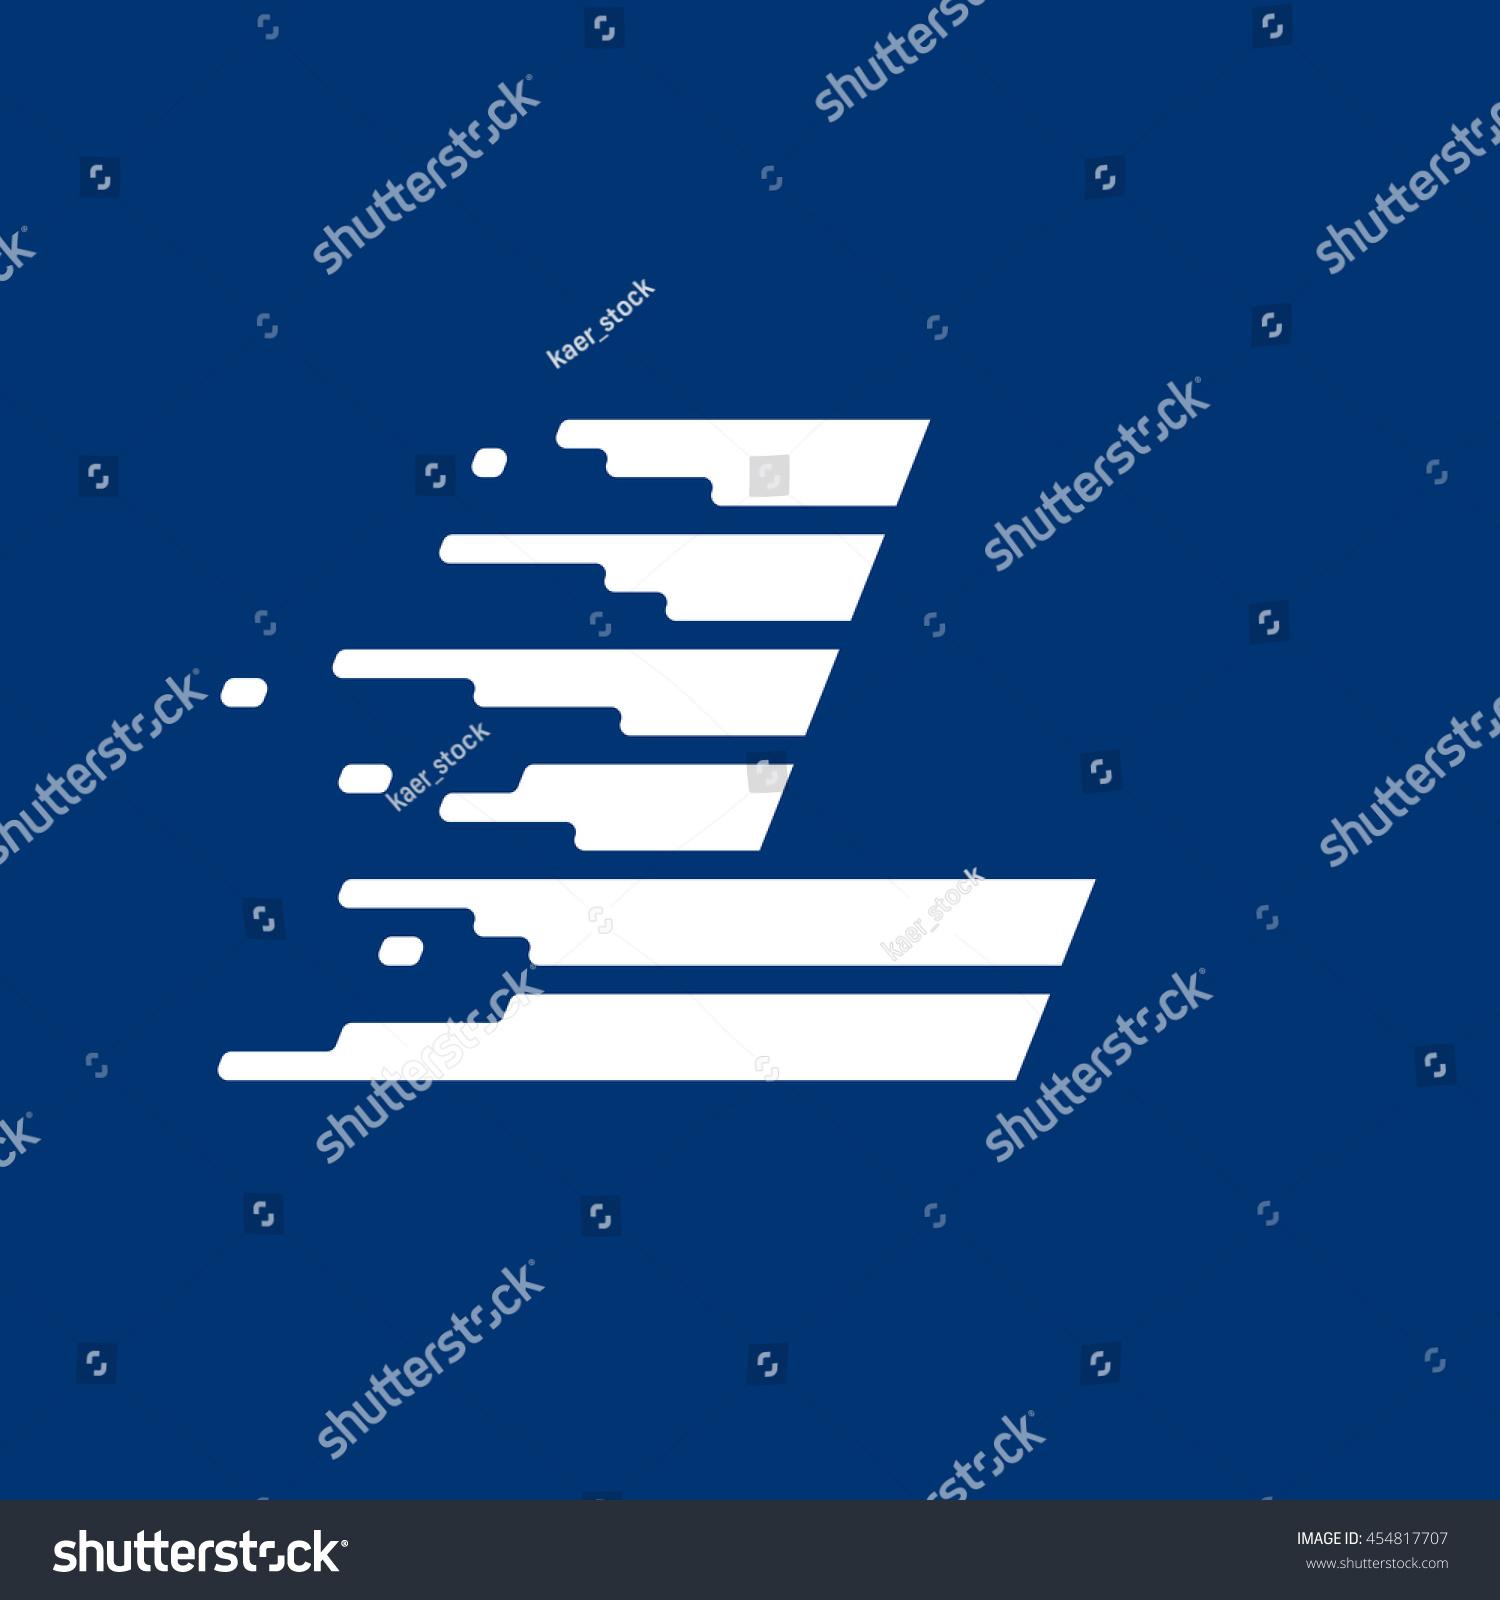 T Letter L Letter Crown Illustration Stock Vector 491487877 ...